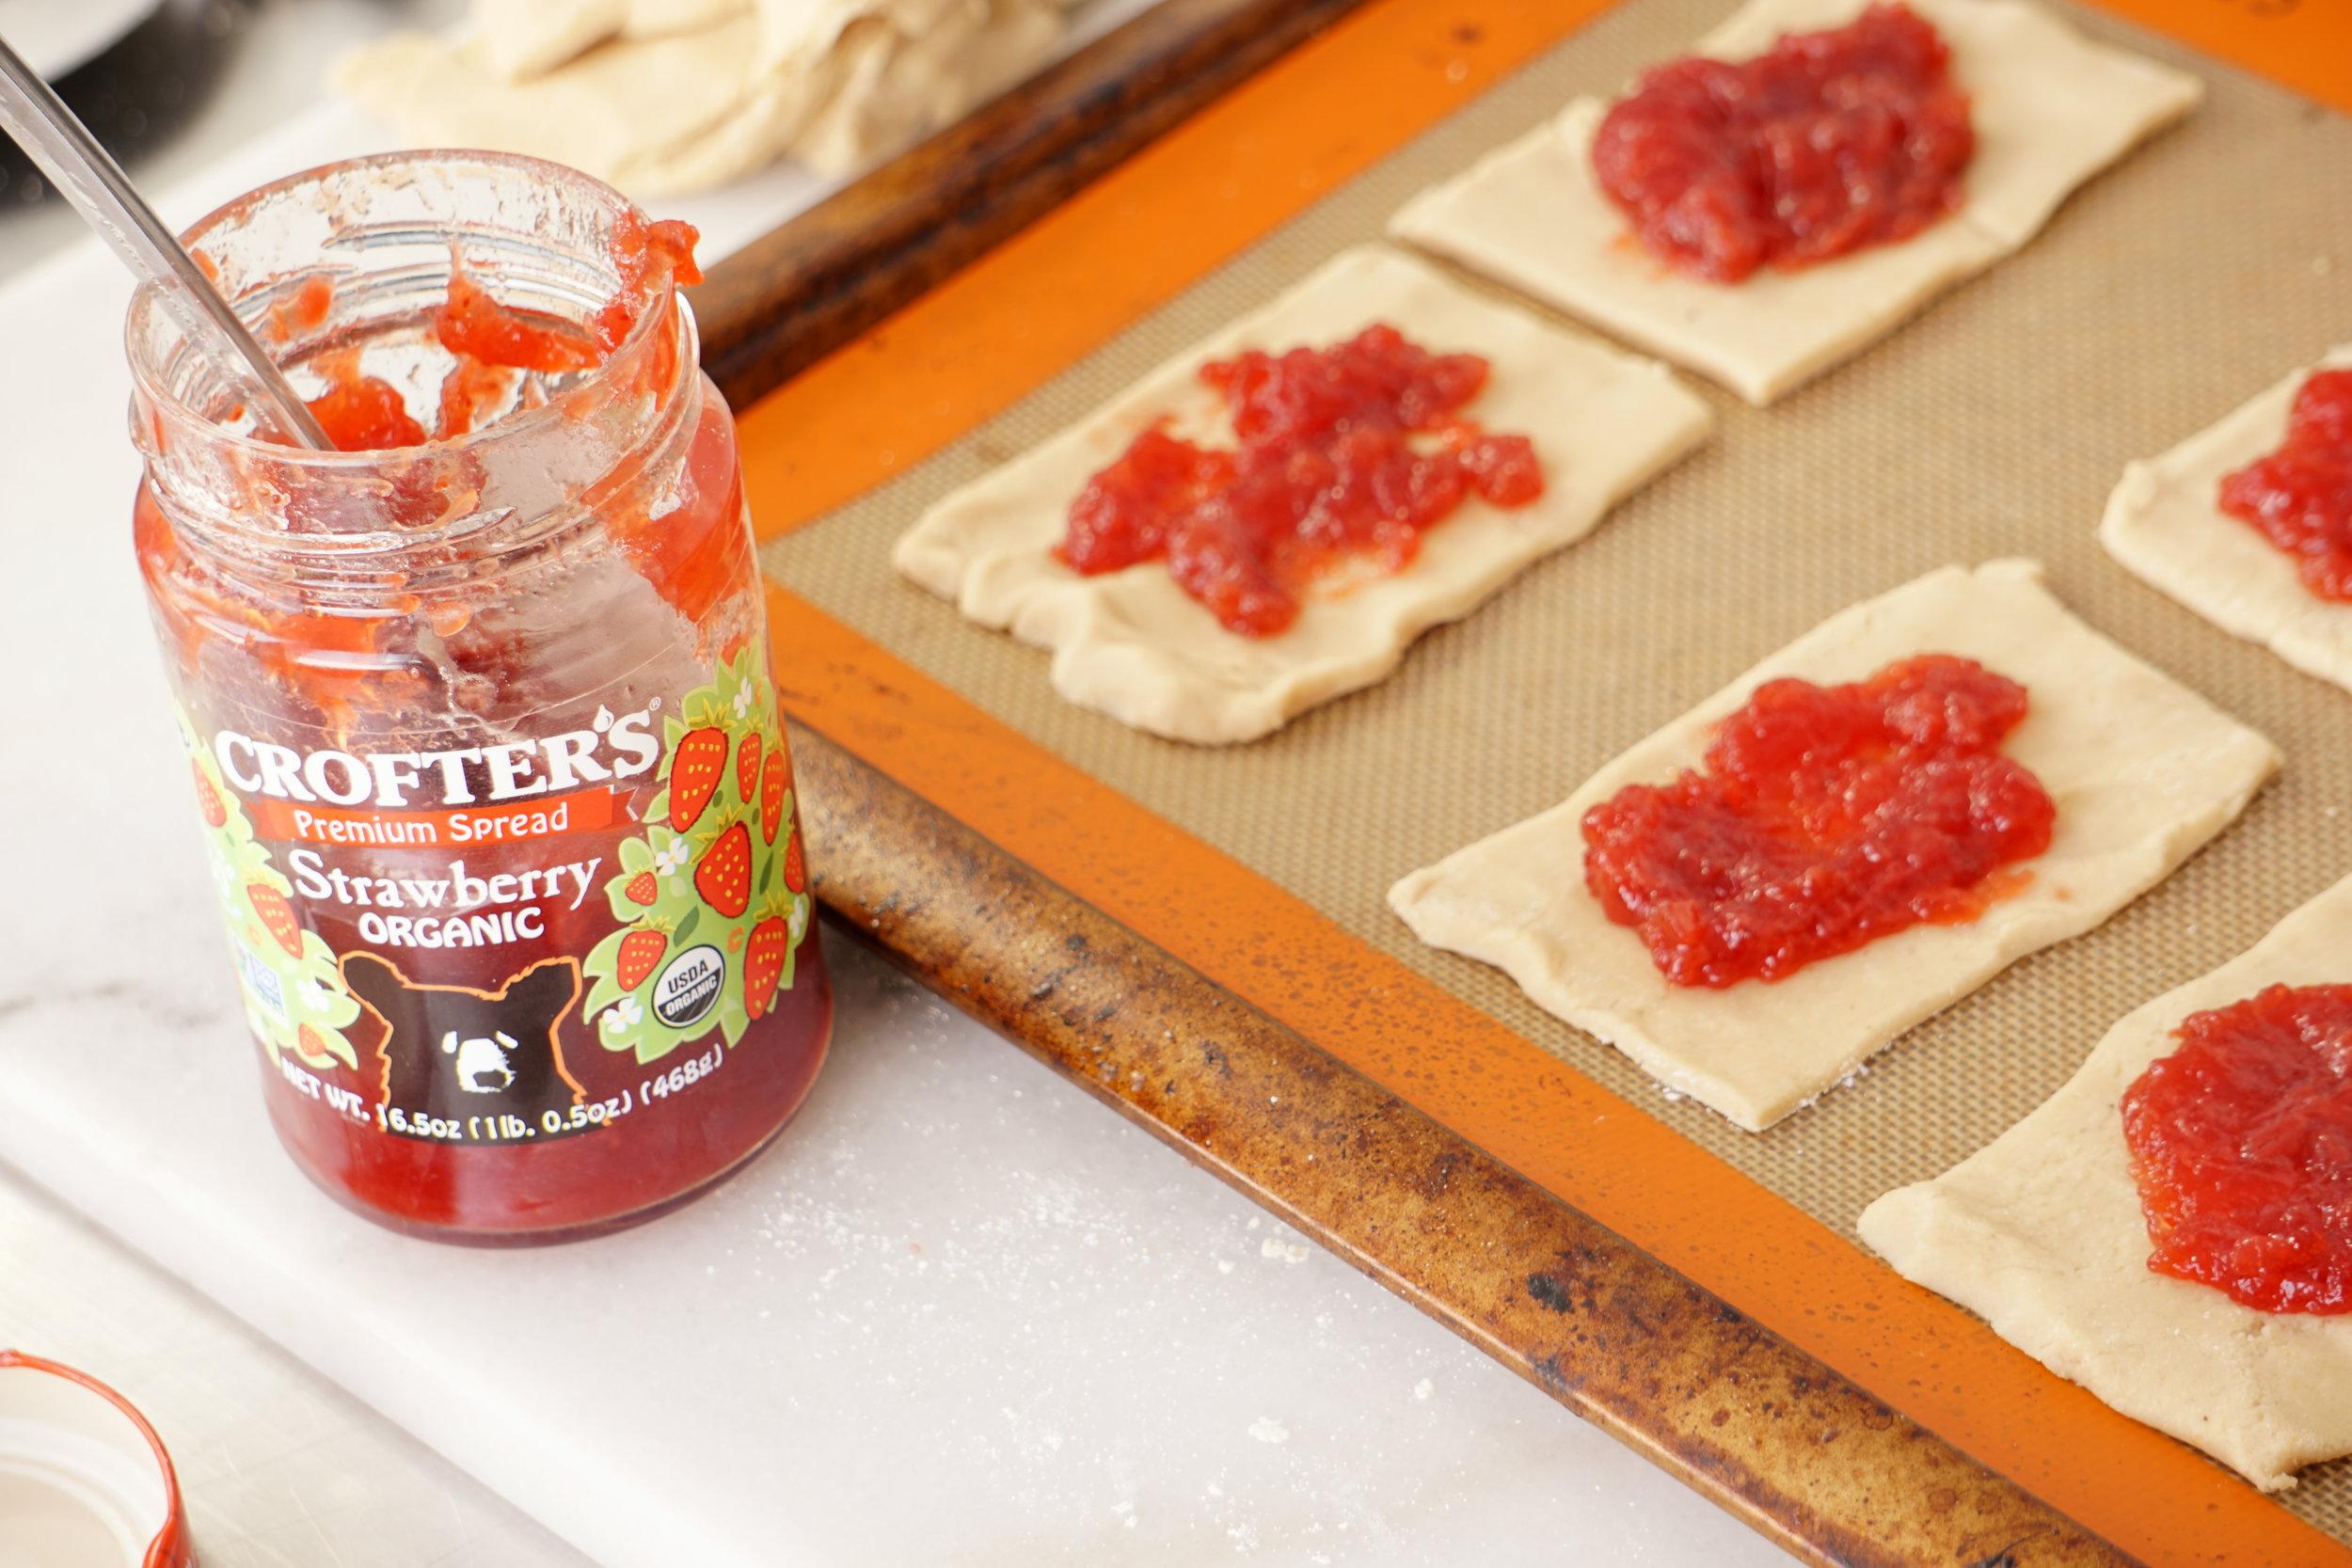 Crofters Organic Jelly  https://amzn.to/2vqXVGi